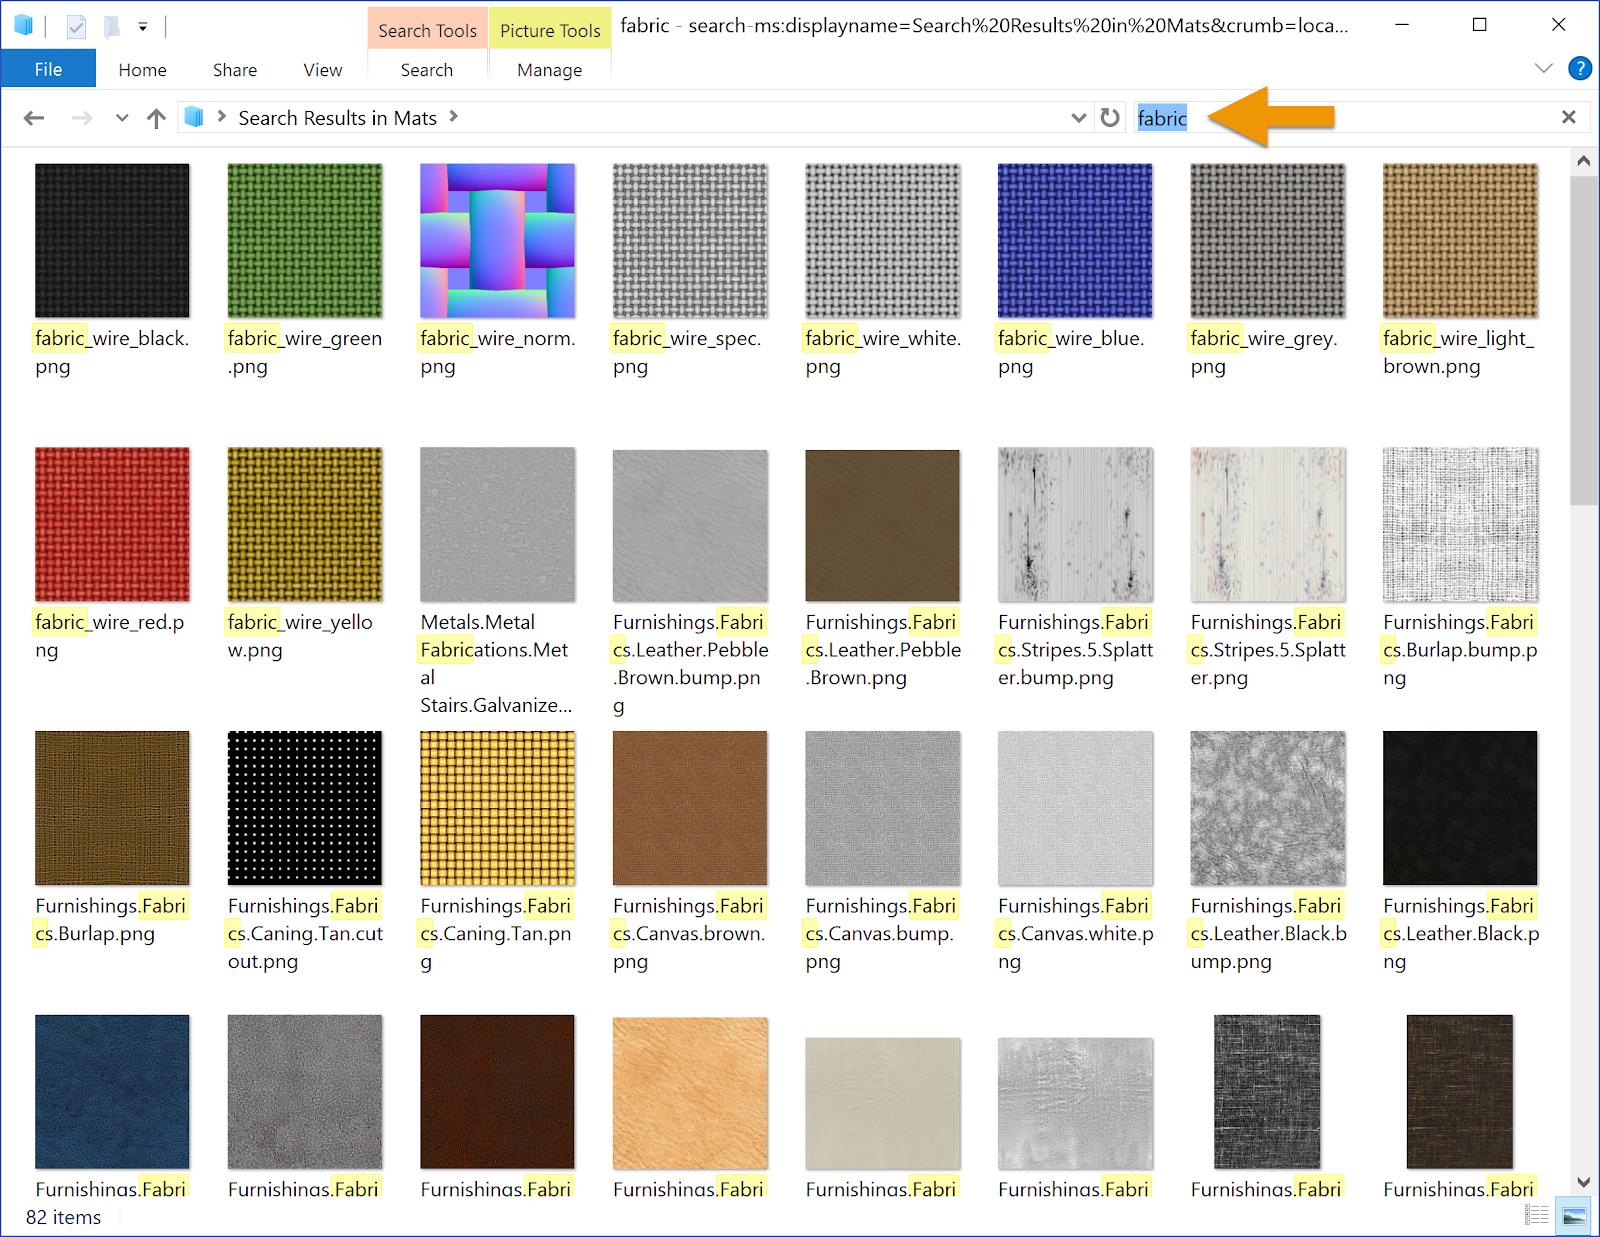 SketchUp Material Editor - Enhanced Materials in SketchUp-13